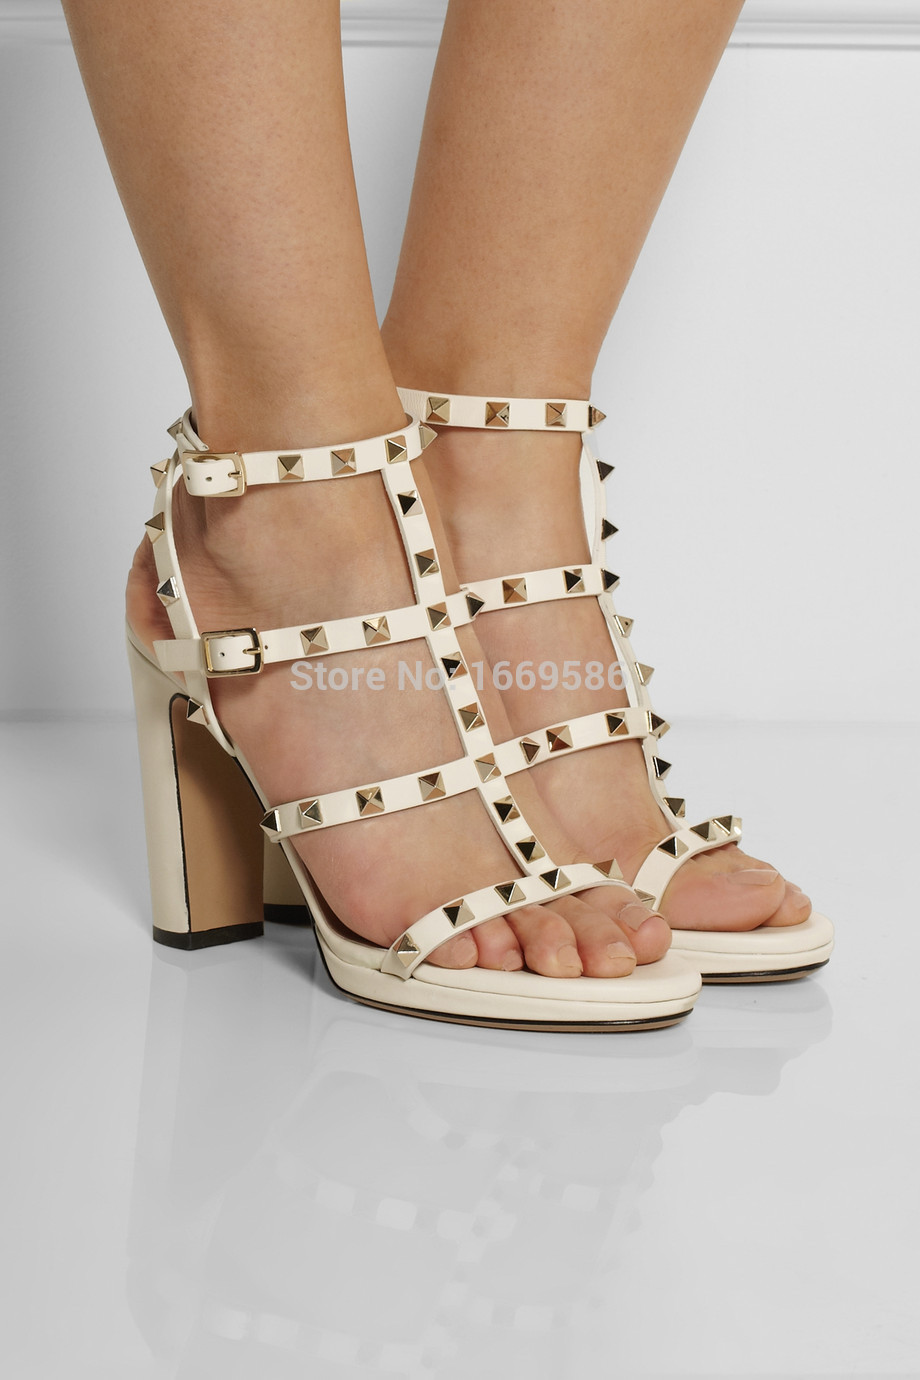 Фотография Shoesofdream  2015 Fashion Rivets Opened Toe White Slingbacks Thin Heel Buckle Coppy Leather Women Summer Square Heel Sandals